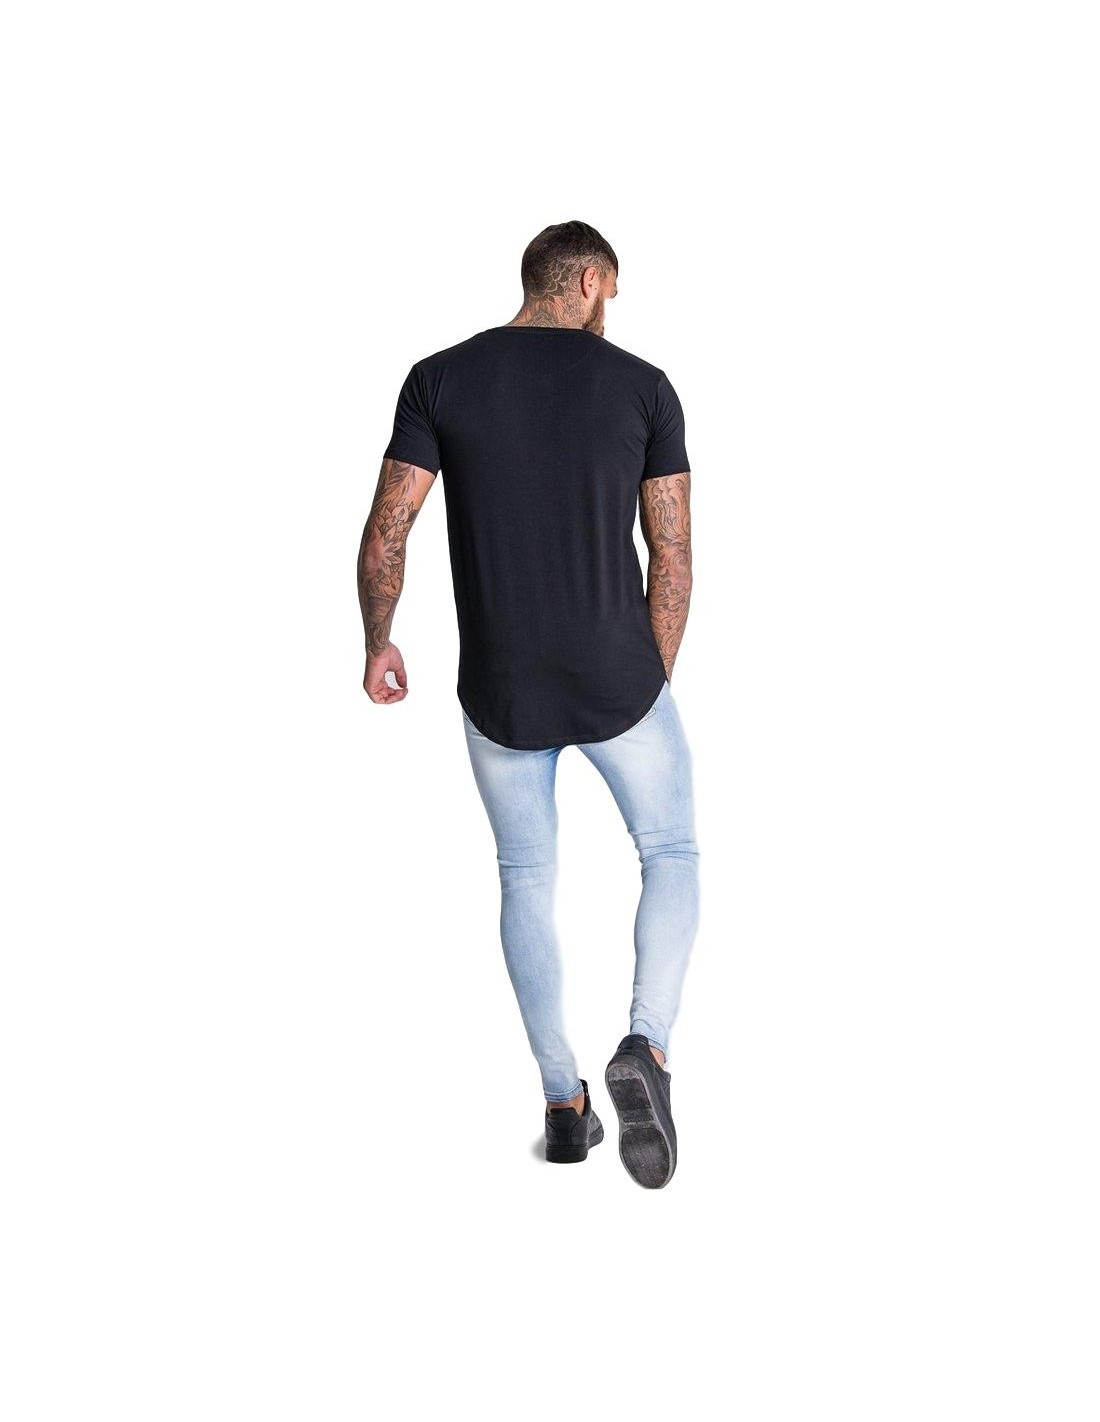 Shirt by SikSilk long sleeve Raglan Navy